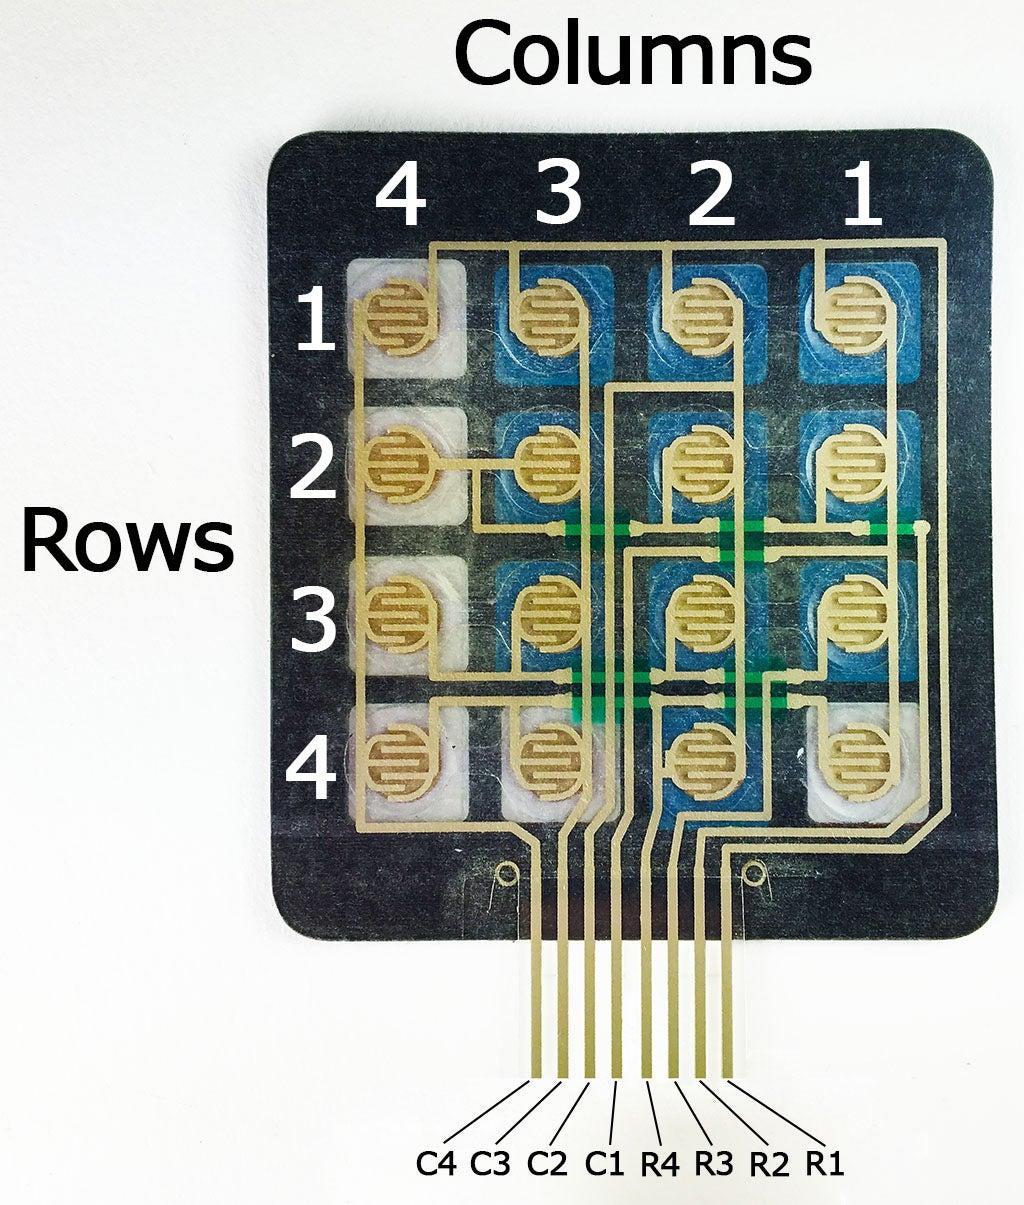 Understanding the Keypad :-